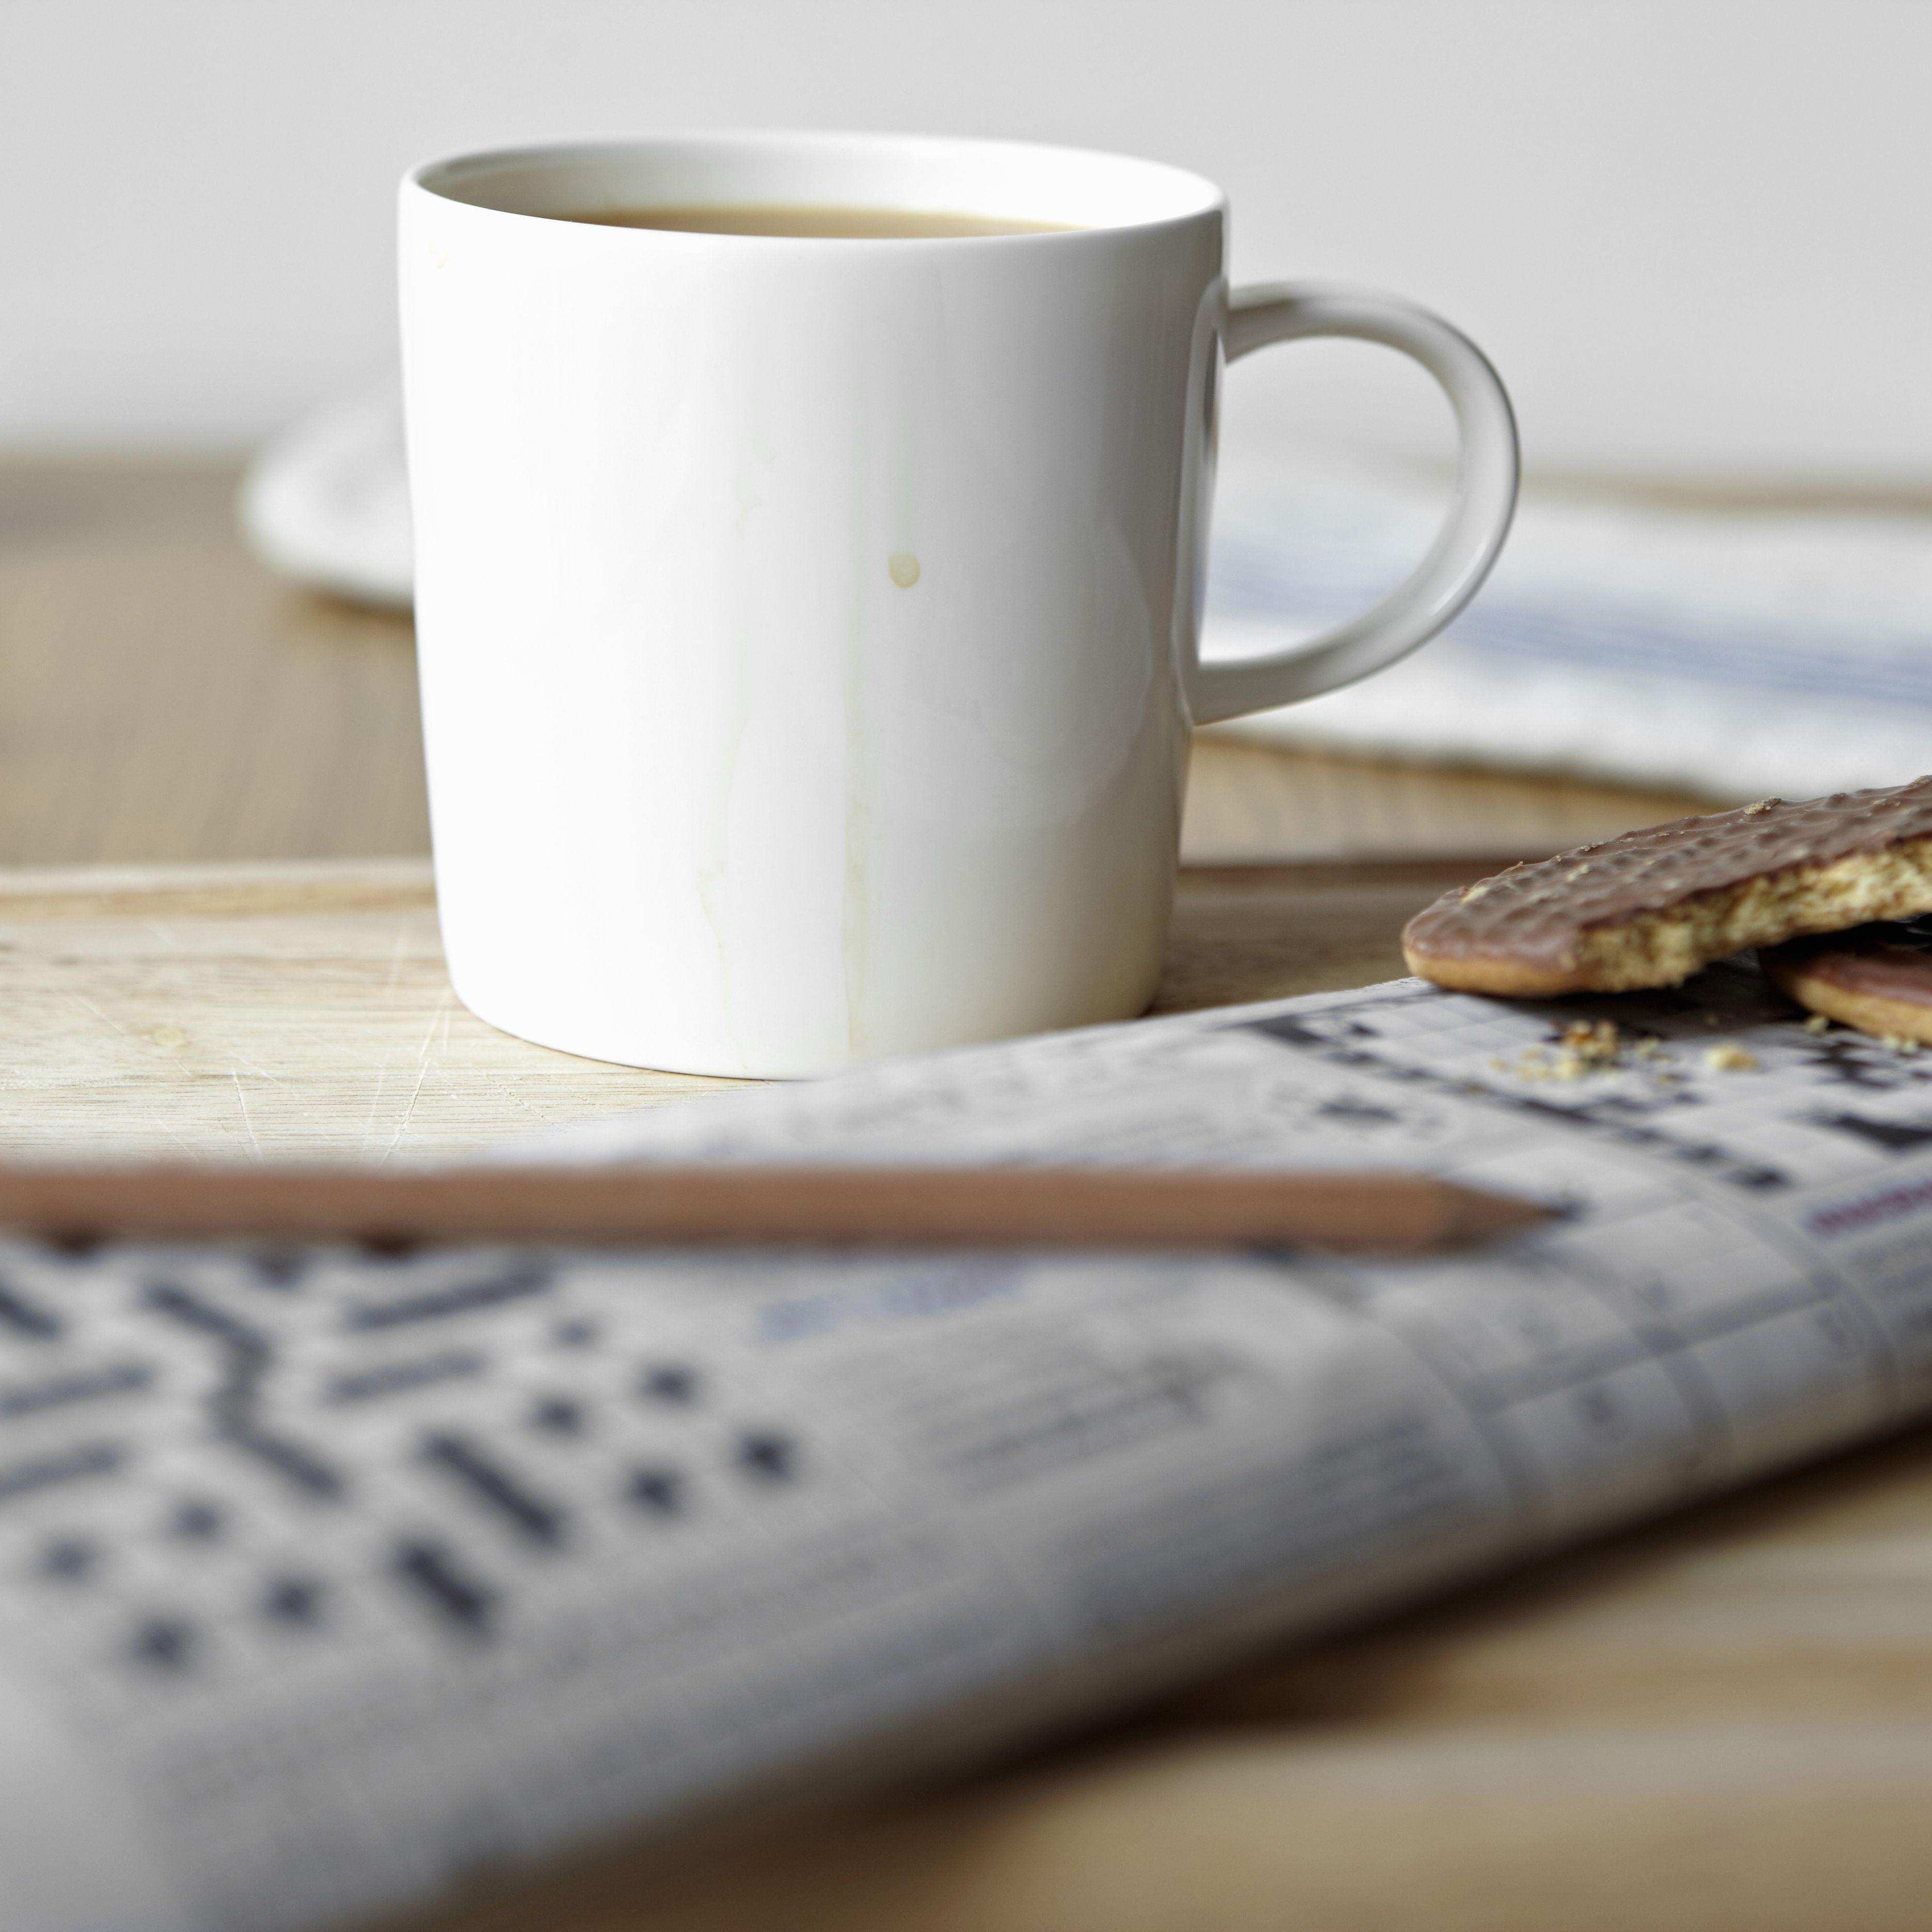 c606413dc70 The 10 Best Coffee Mugs of 2019